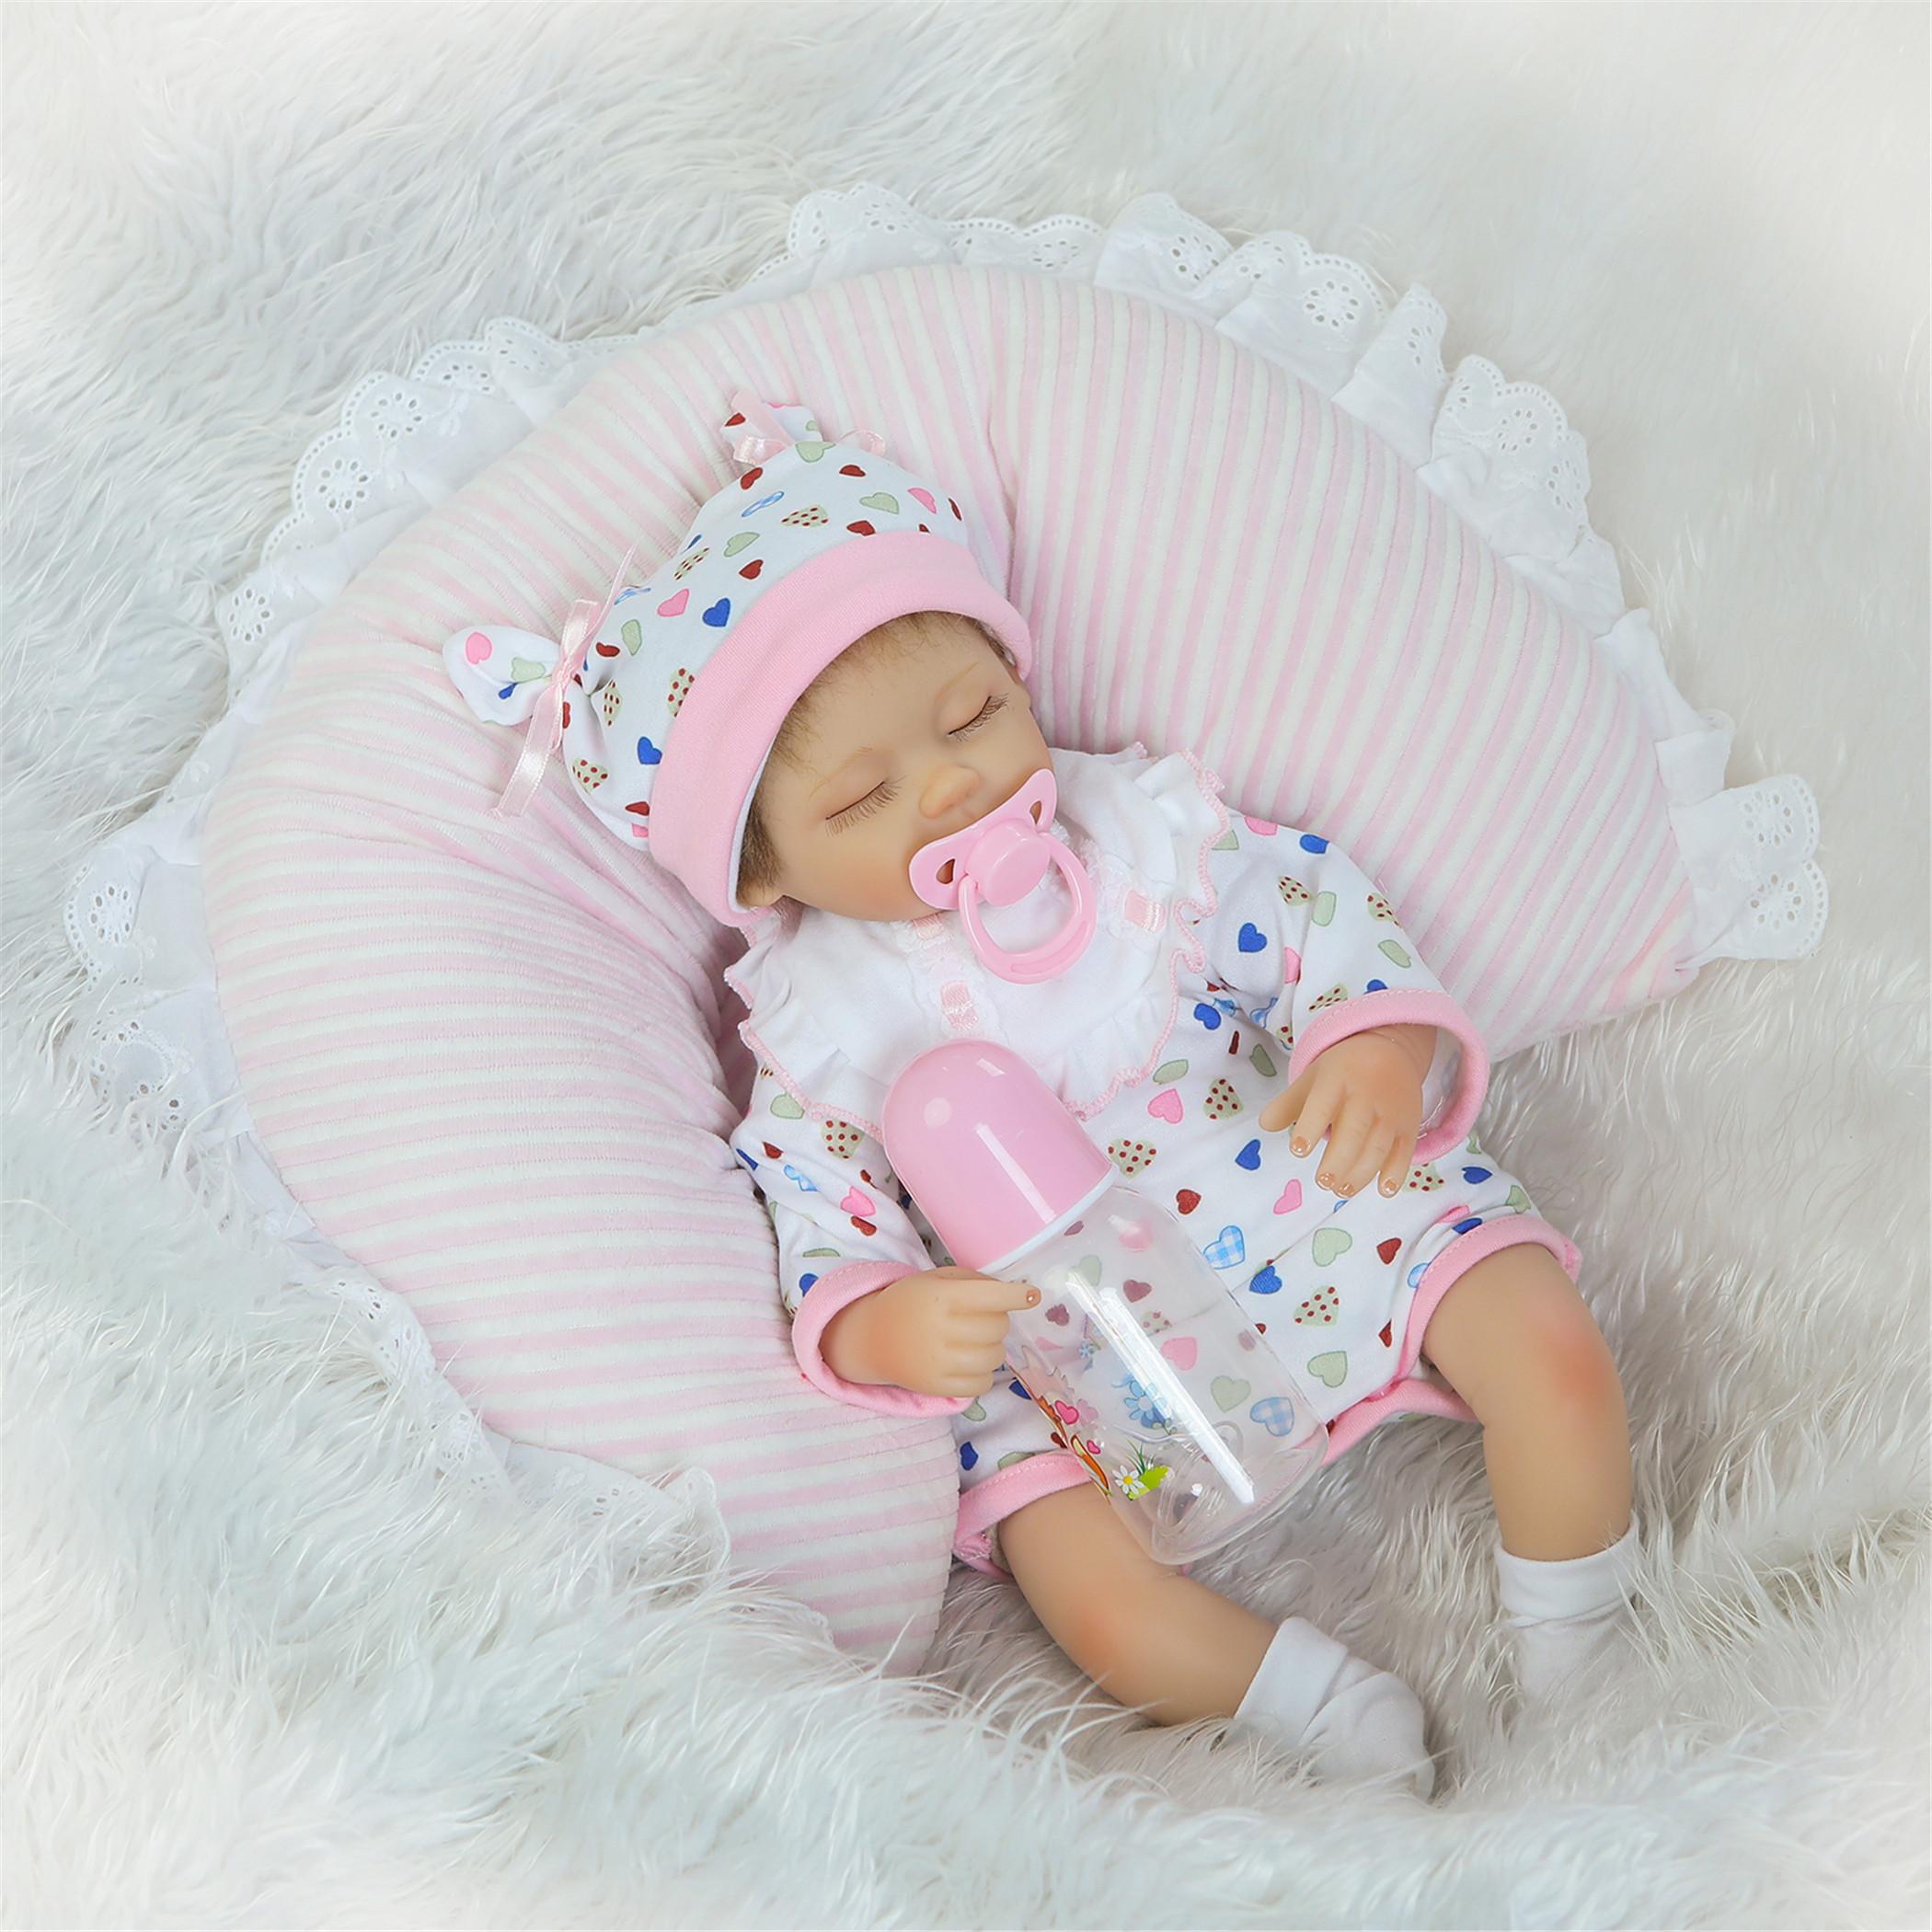 Npk Collection Reborn Baby Doll Soft Silicone Vinyl 18inch